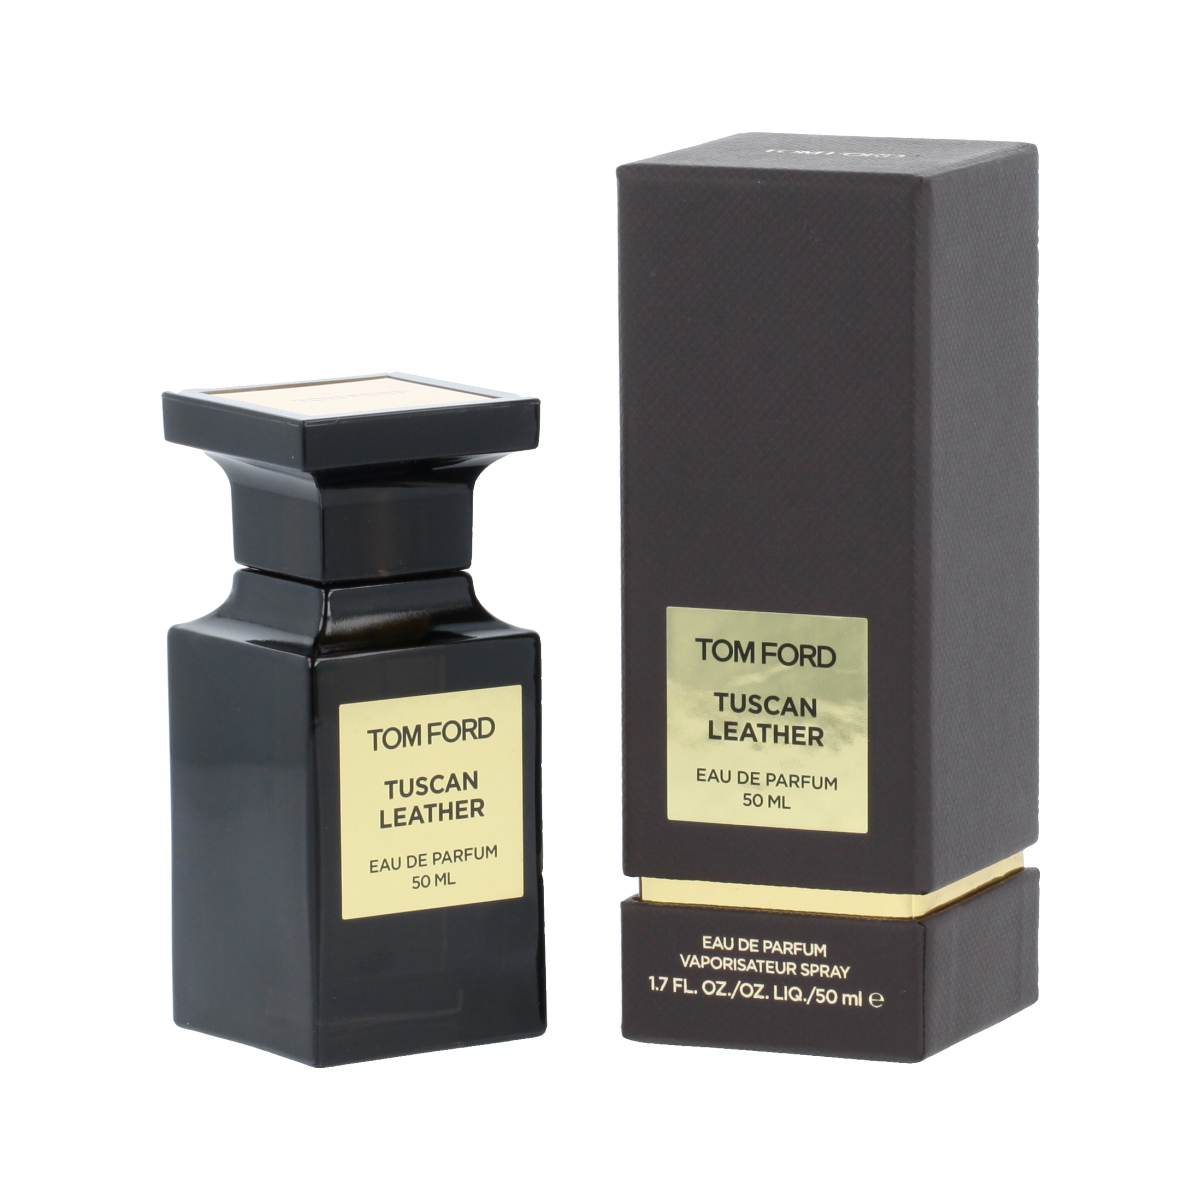 Tom Ford Tuscan Leather Eau De Parfum 50 ml (unisex) 91493